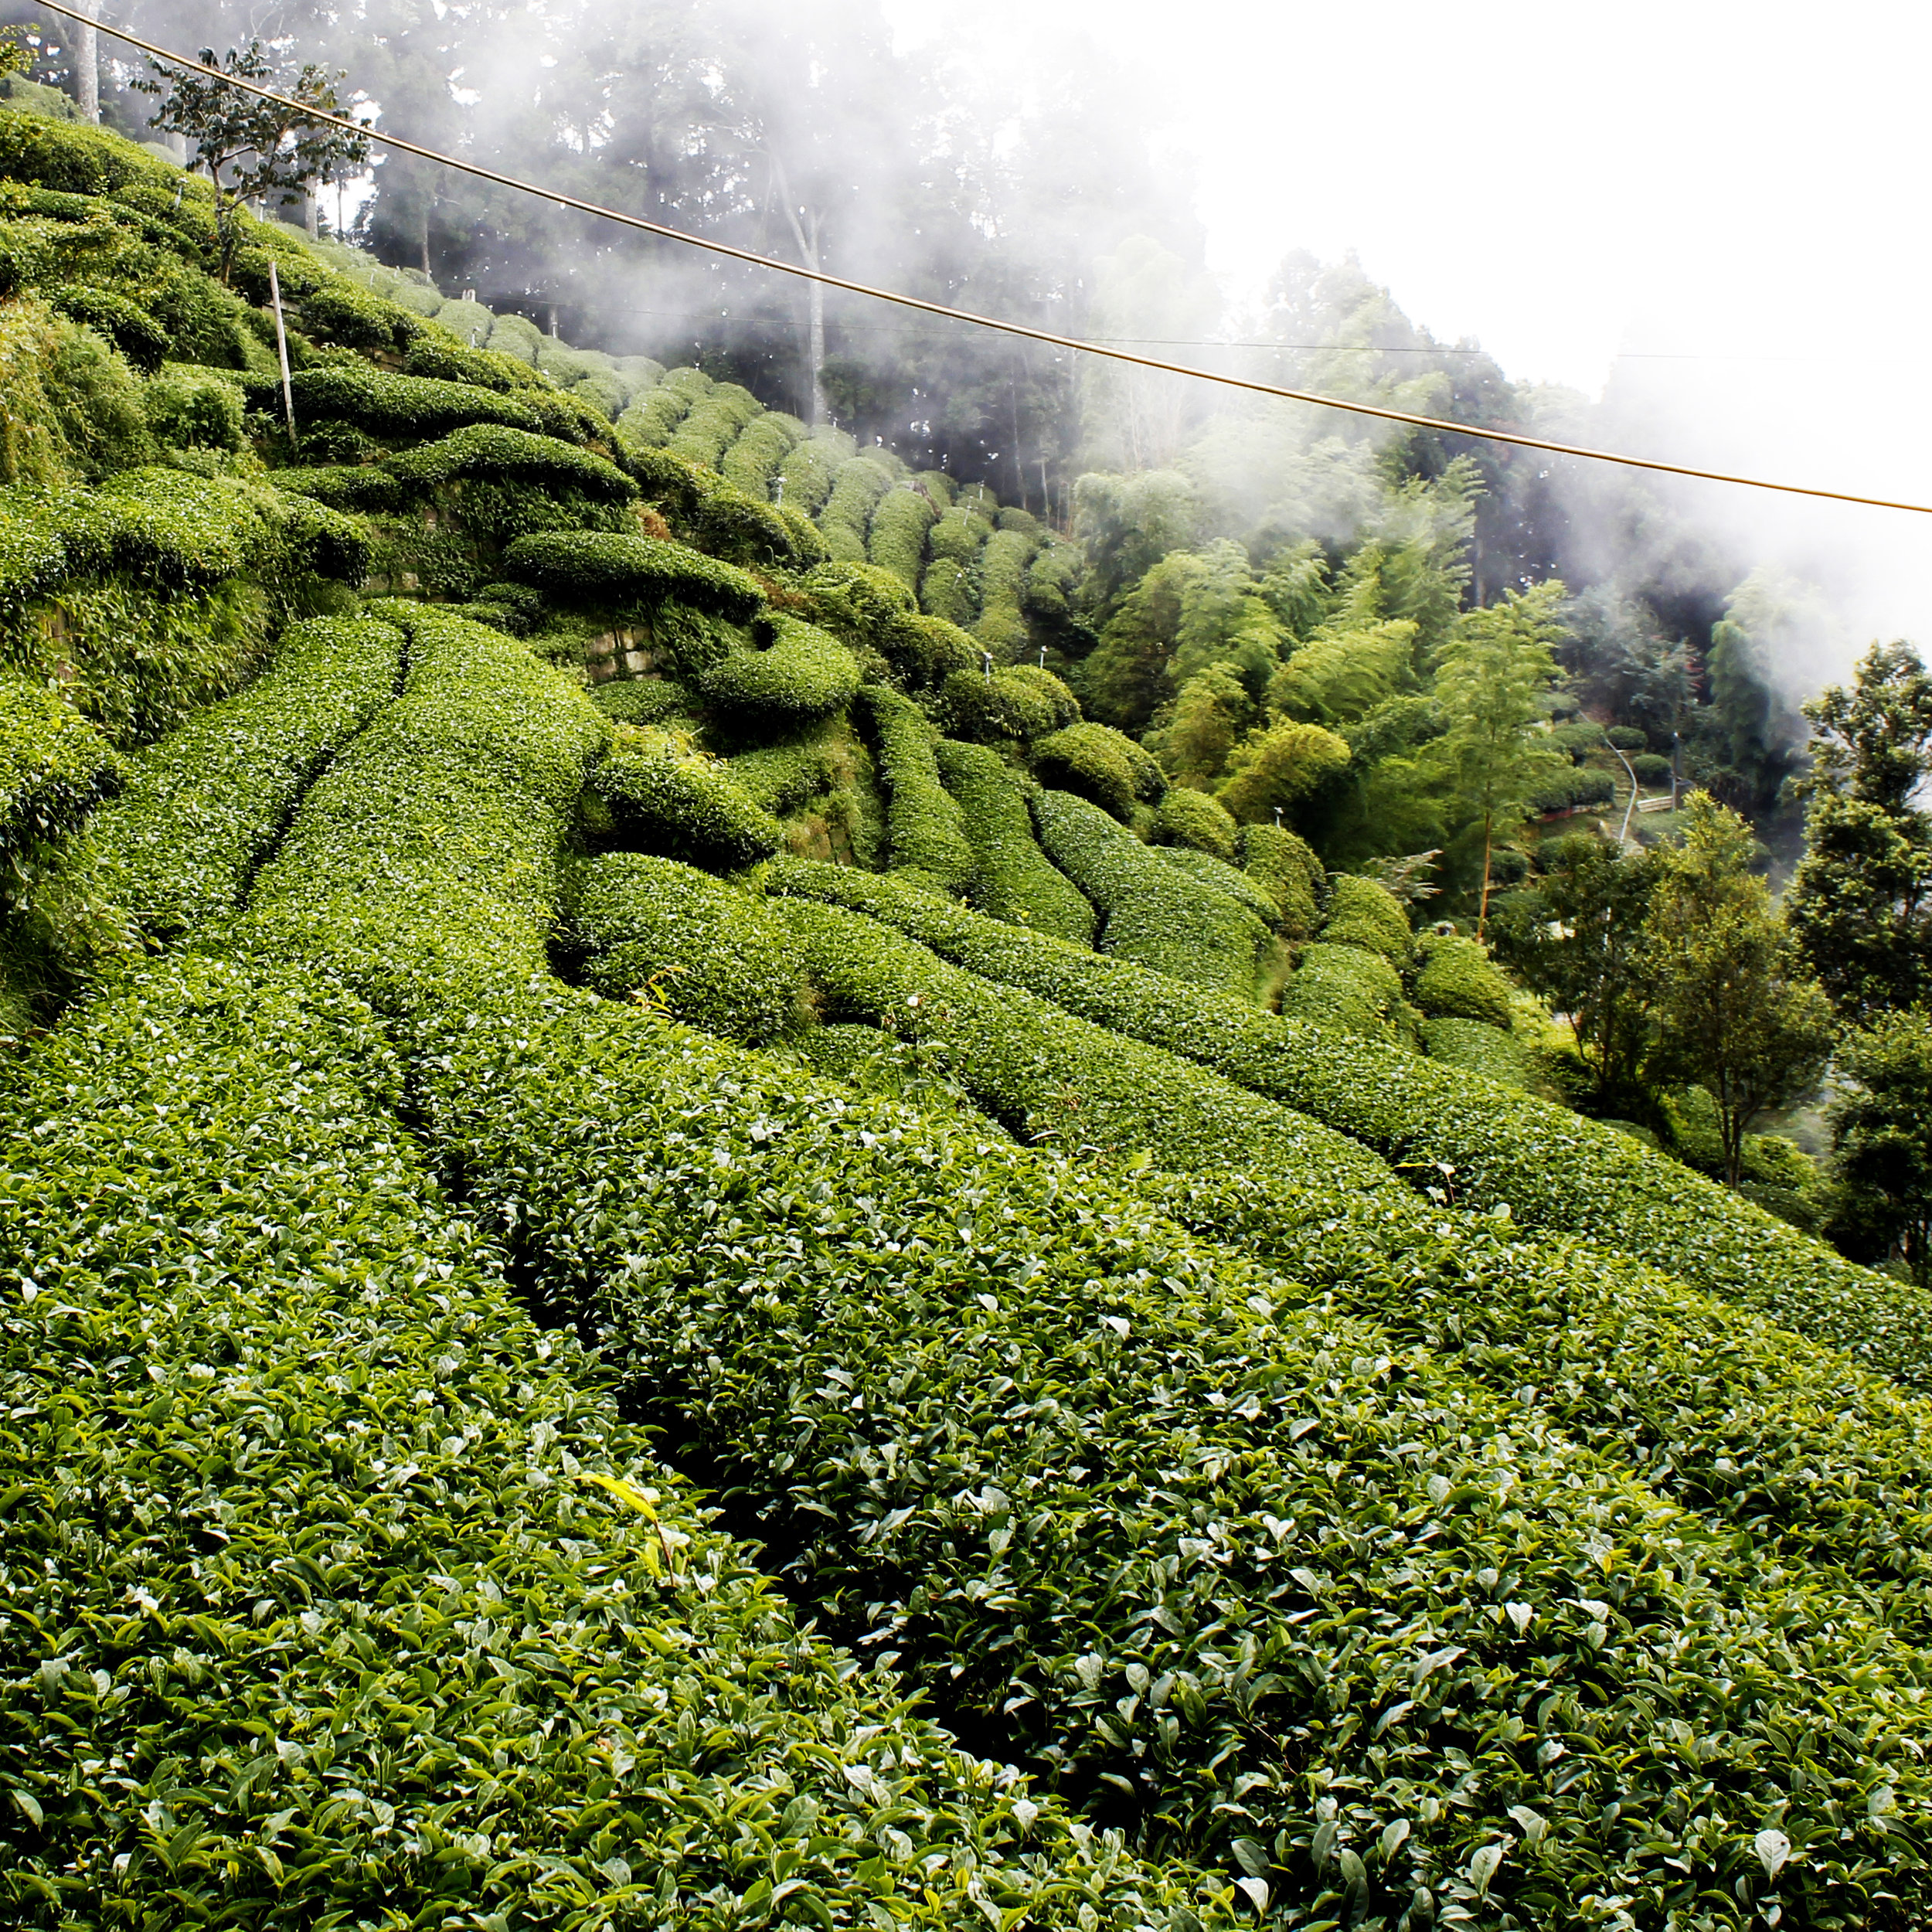 FujianToAliShan-mem-oolong-loose-whole-leaf-tea-2.jpg